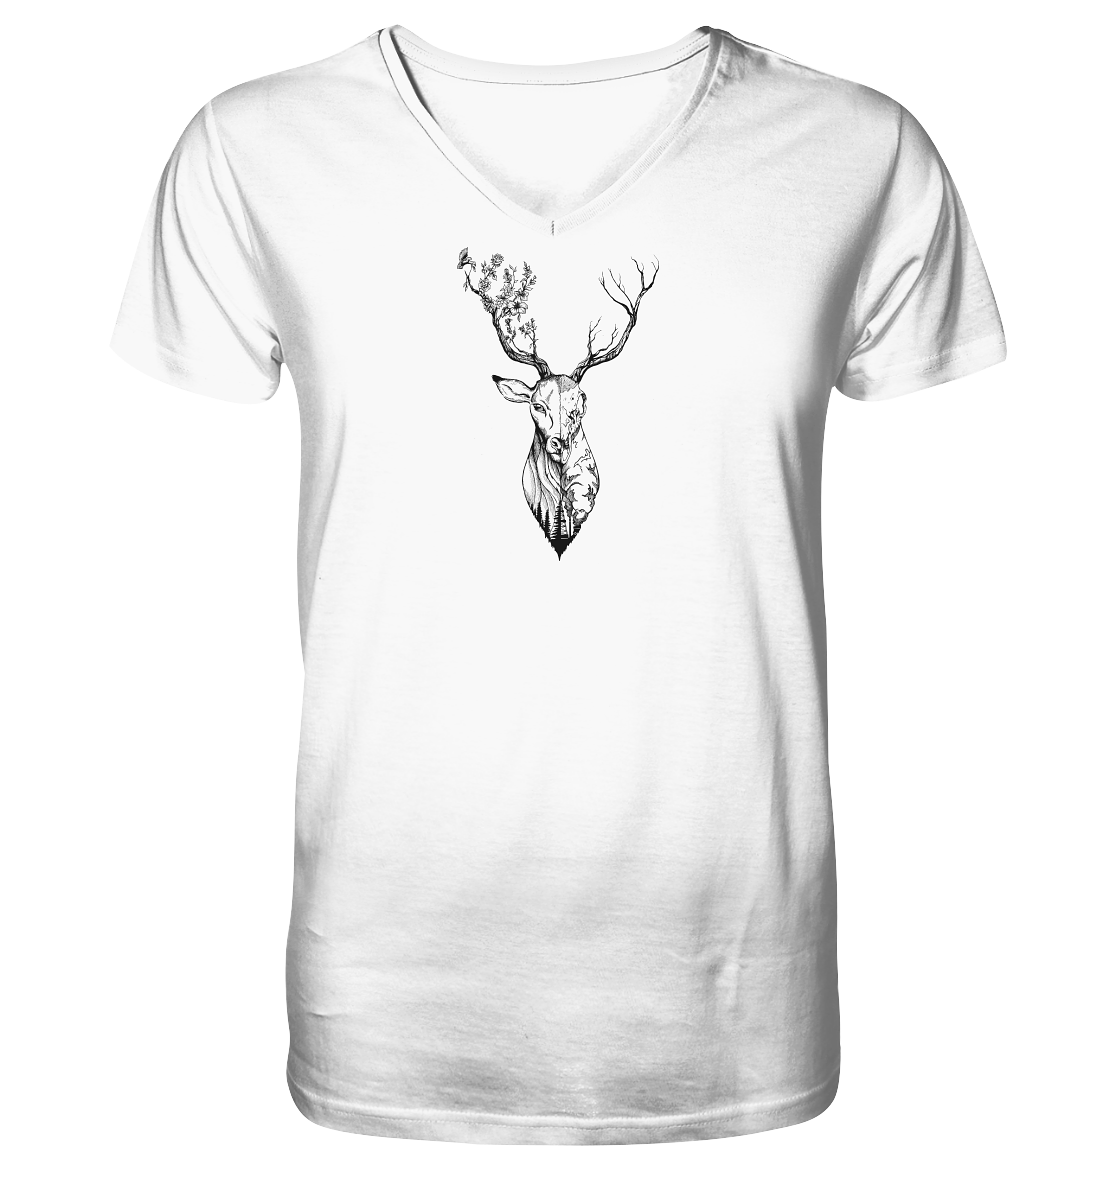 front-mens-organic-v-neck-shirt-f8f8f8-1116x-6.png